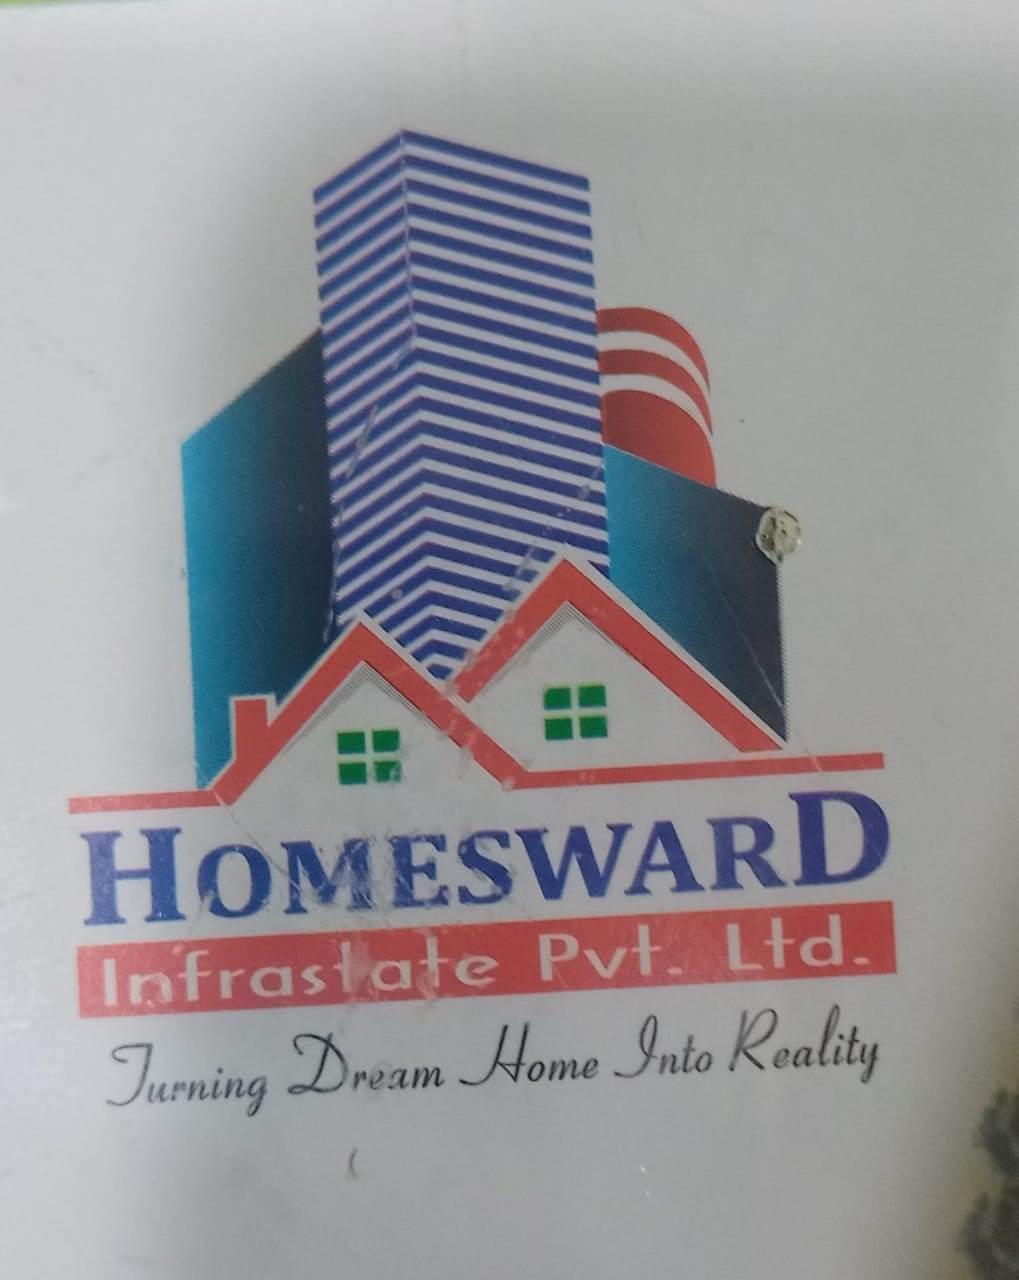 Homesward Infrastate Pvt Ltd